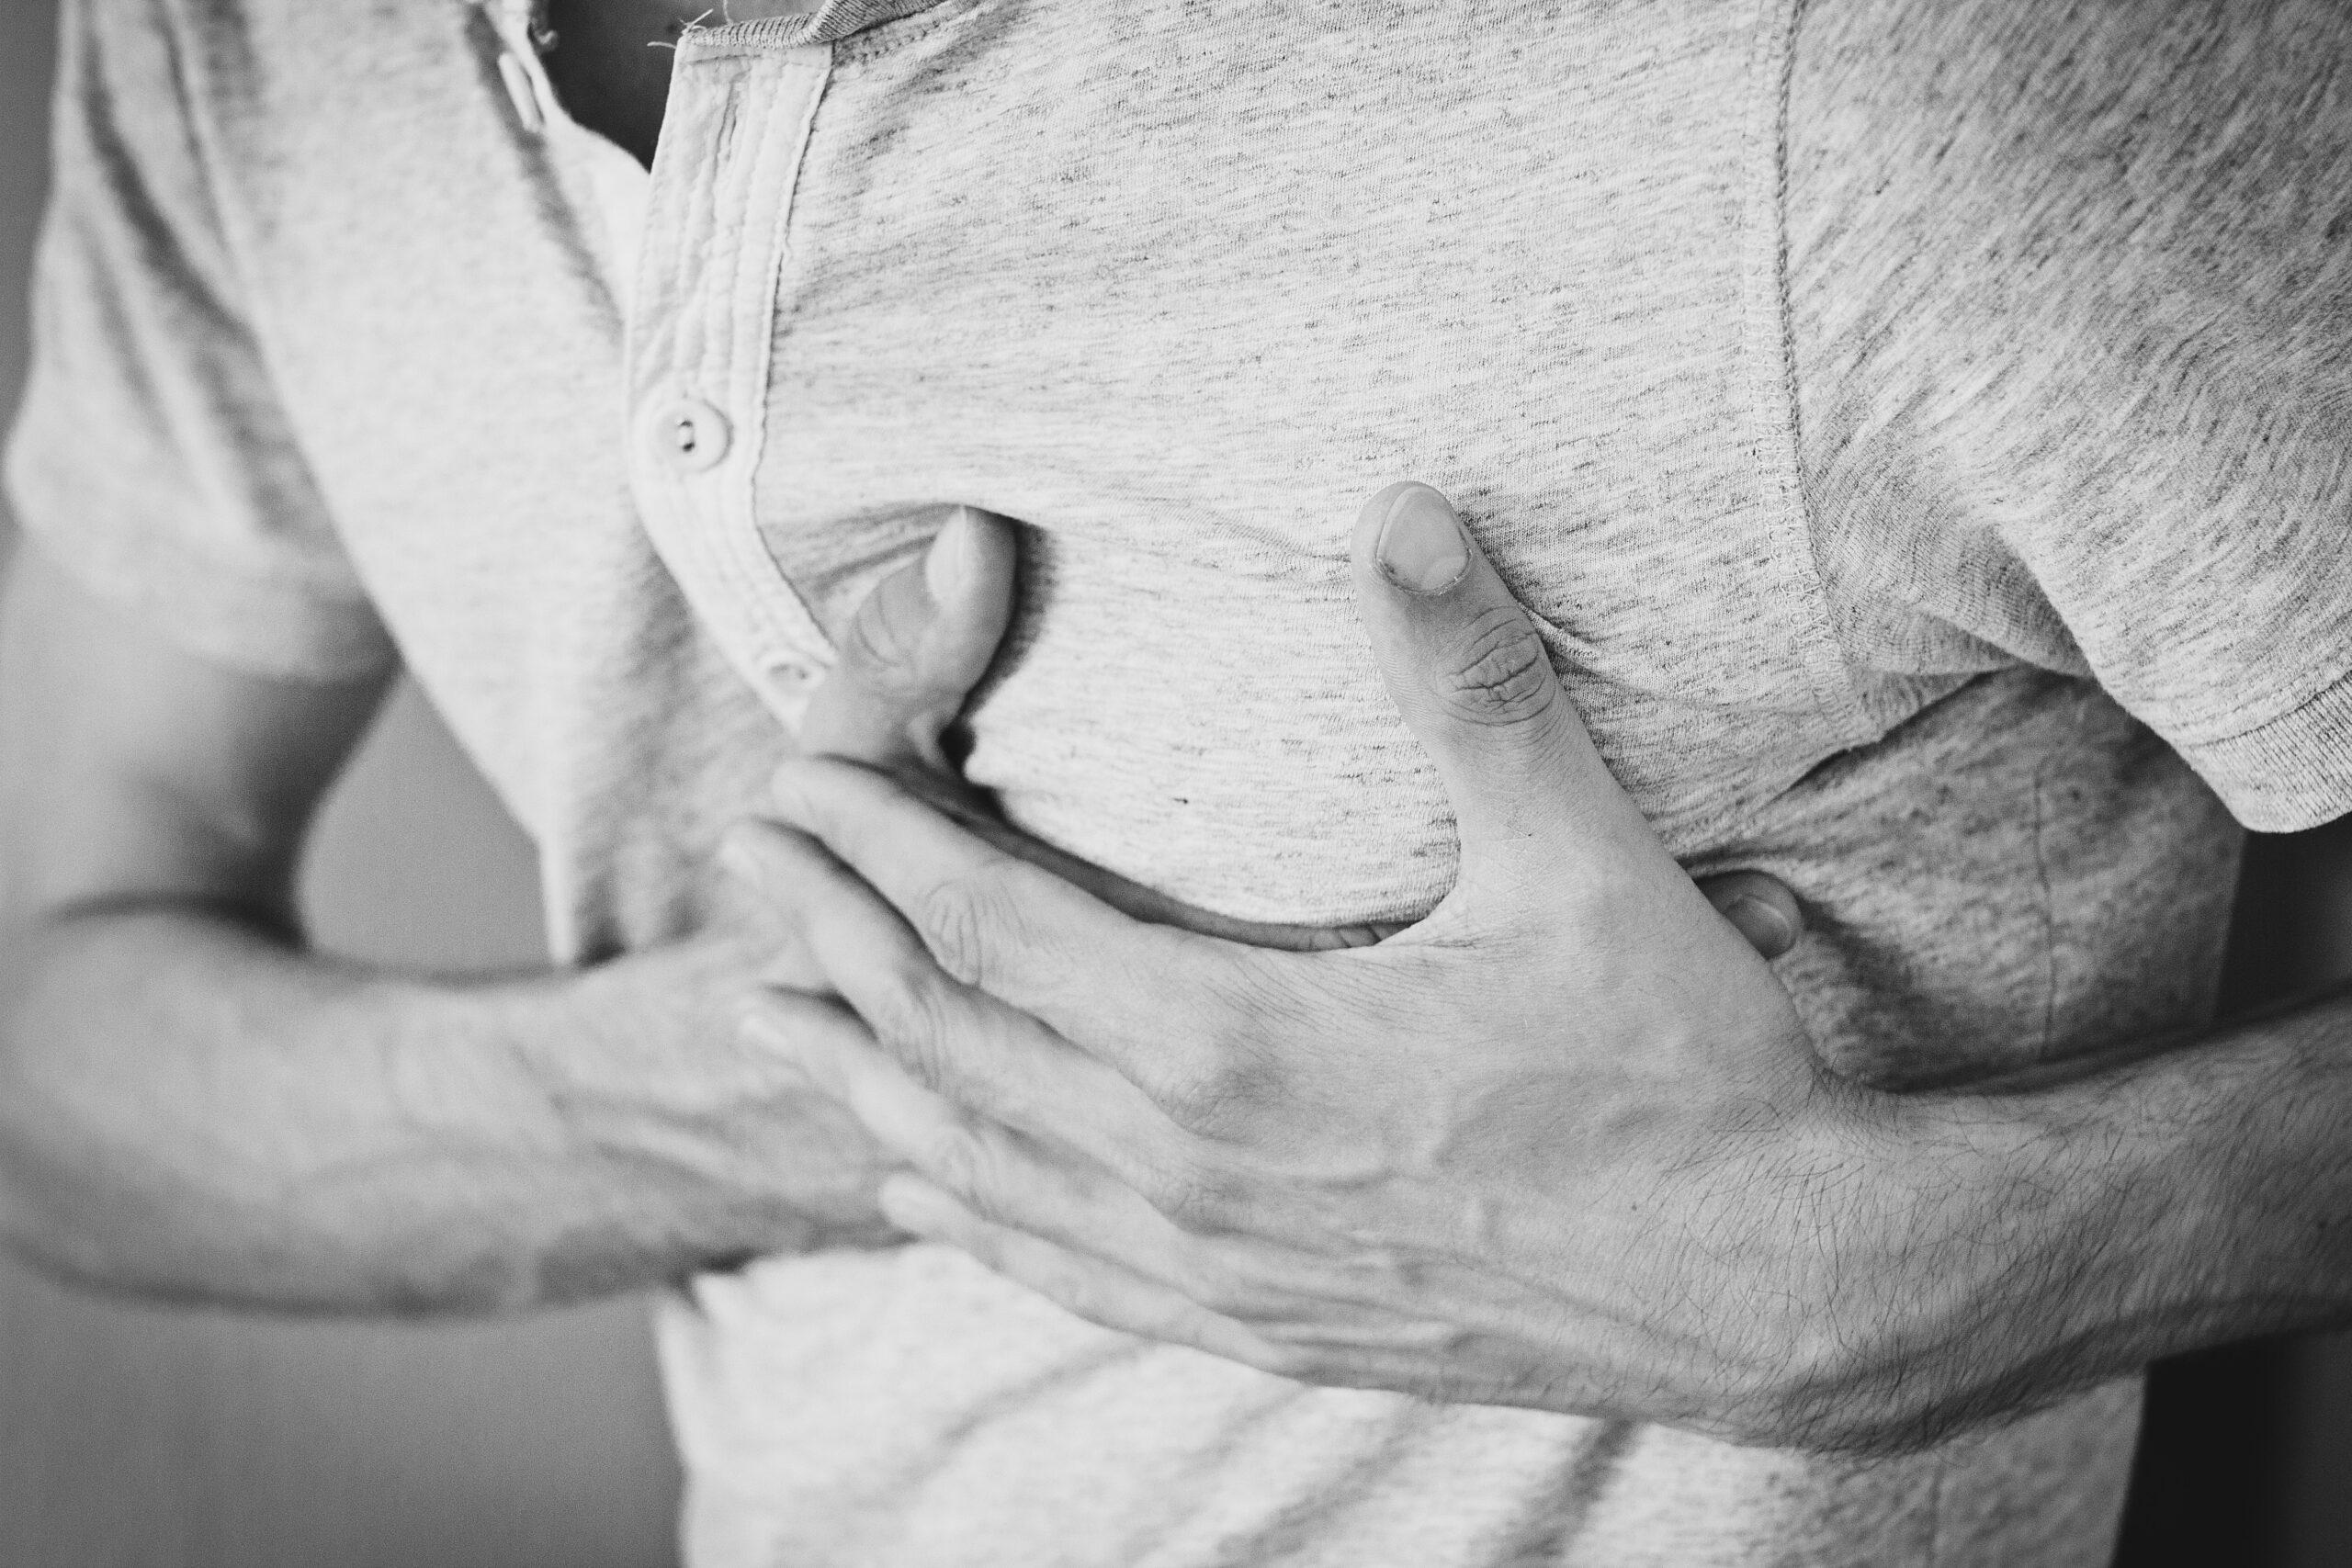 Tietze-szindróma – Mit kell tudni róla?